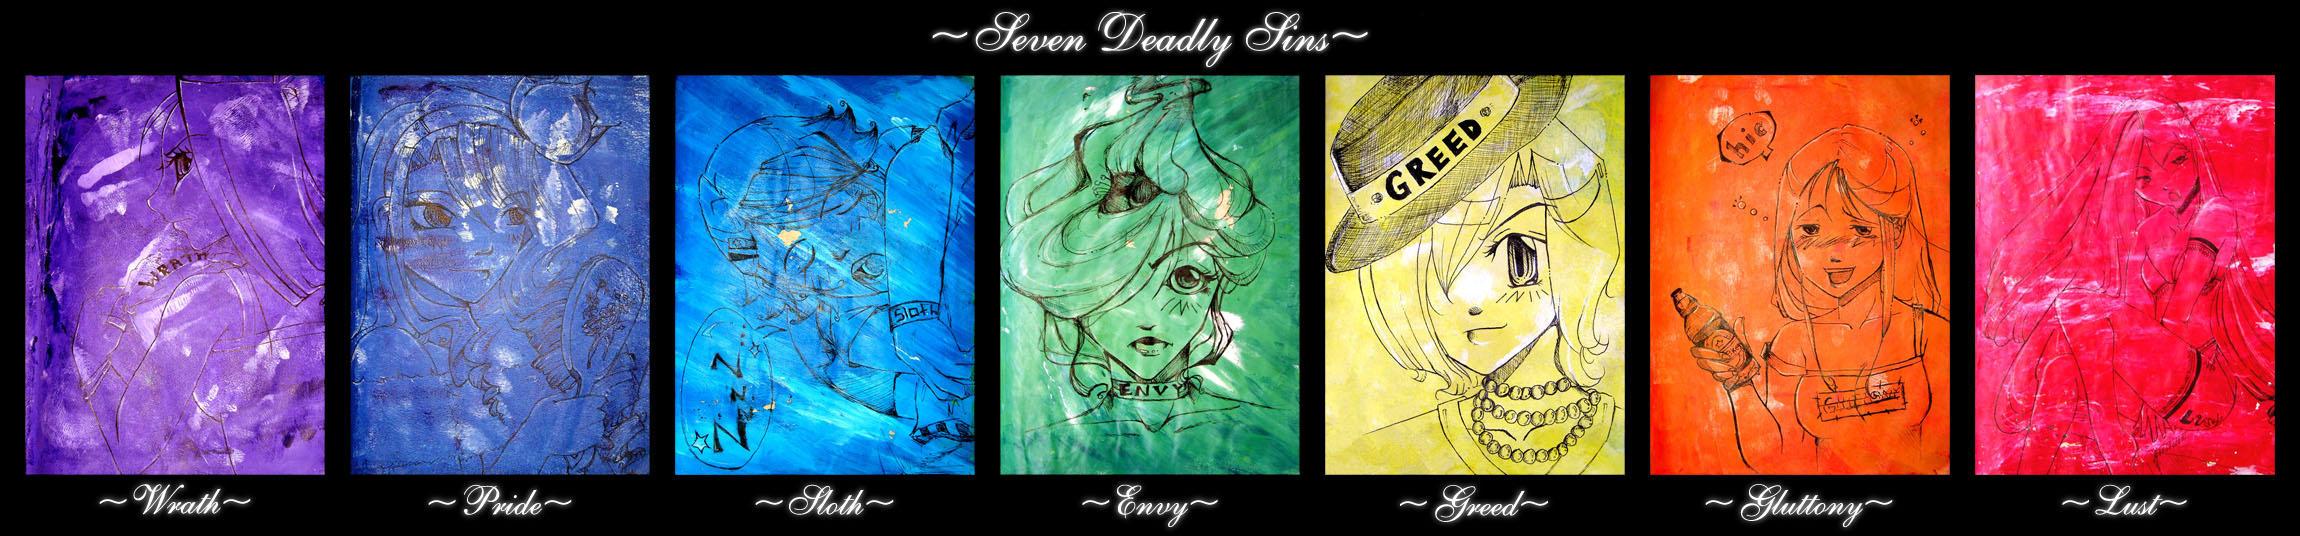 7 Deadly Sins by kristina1234u